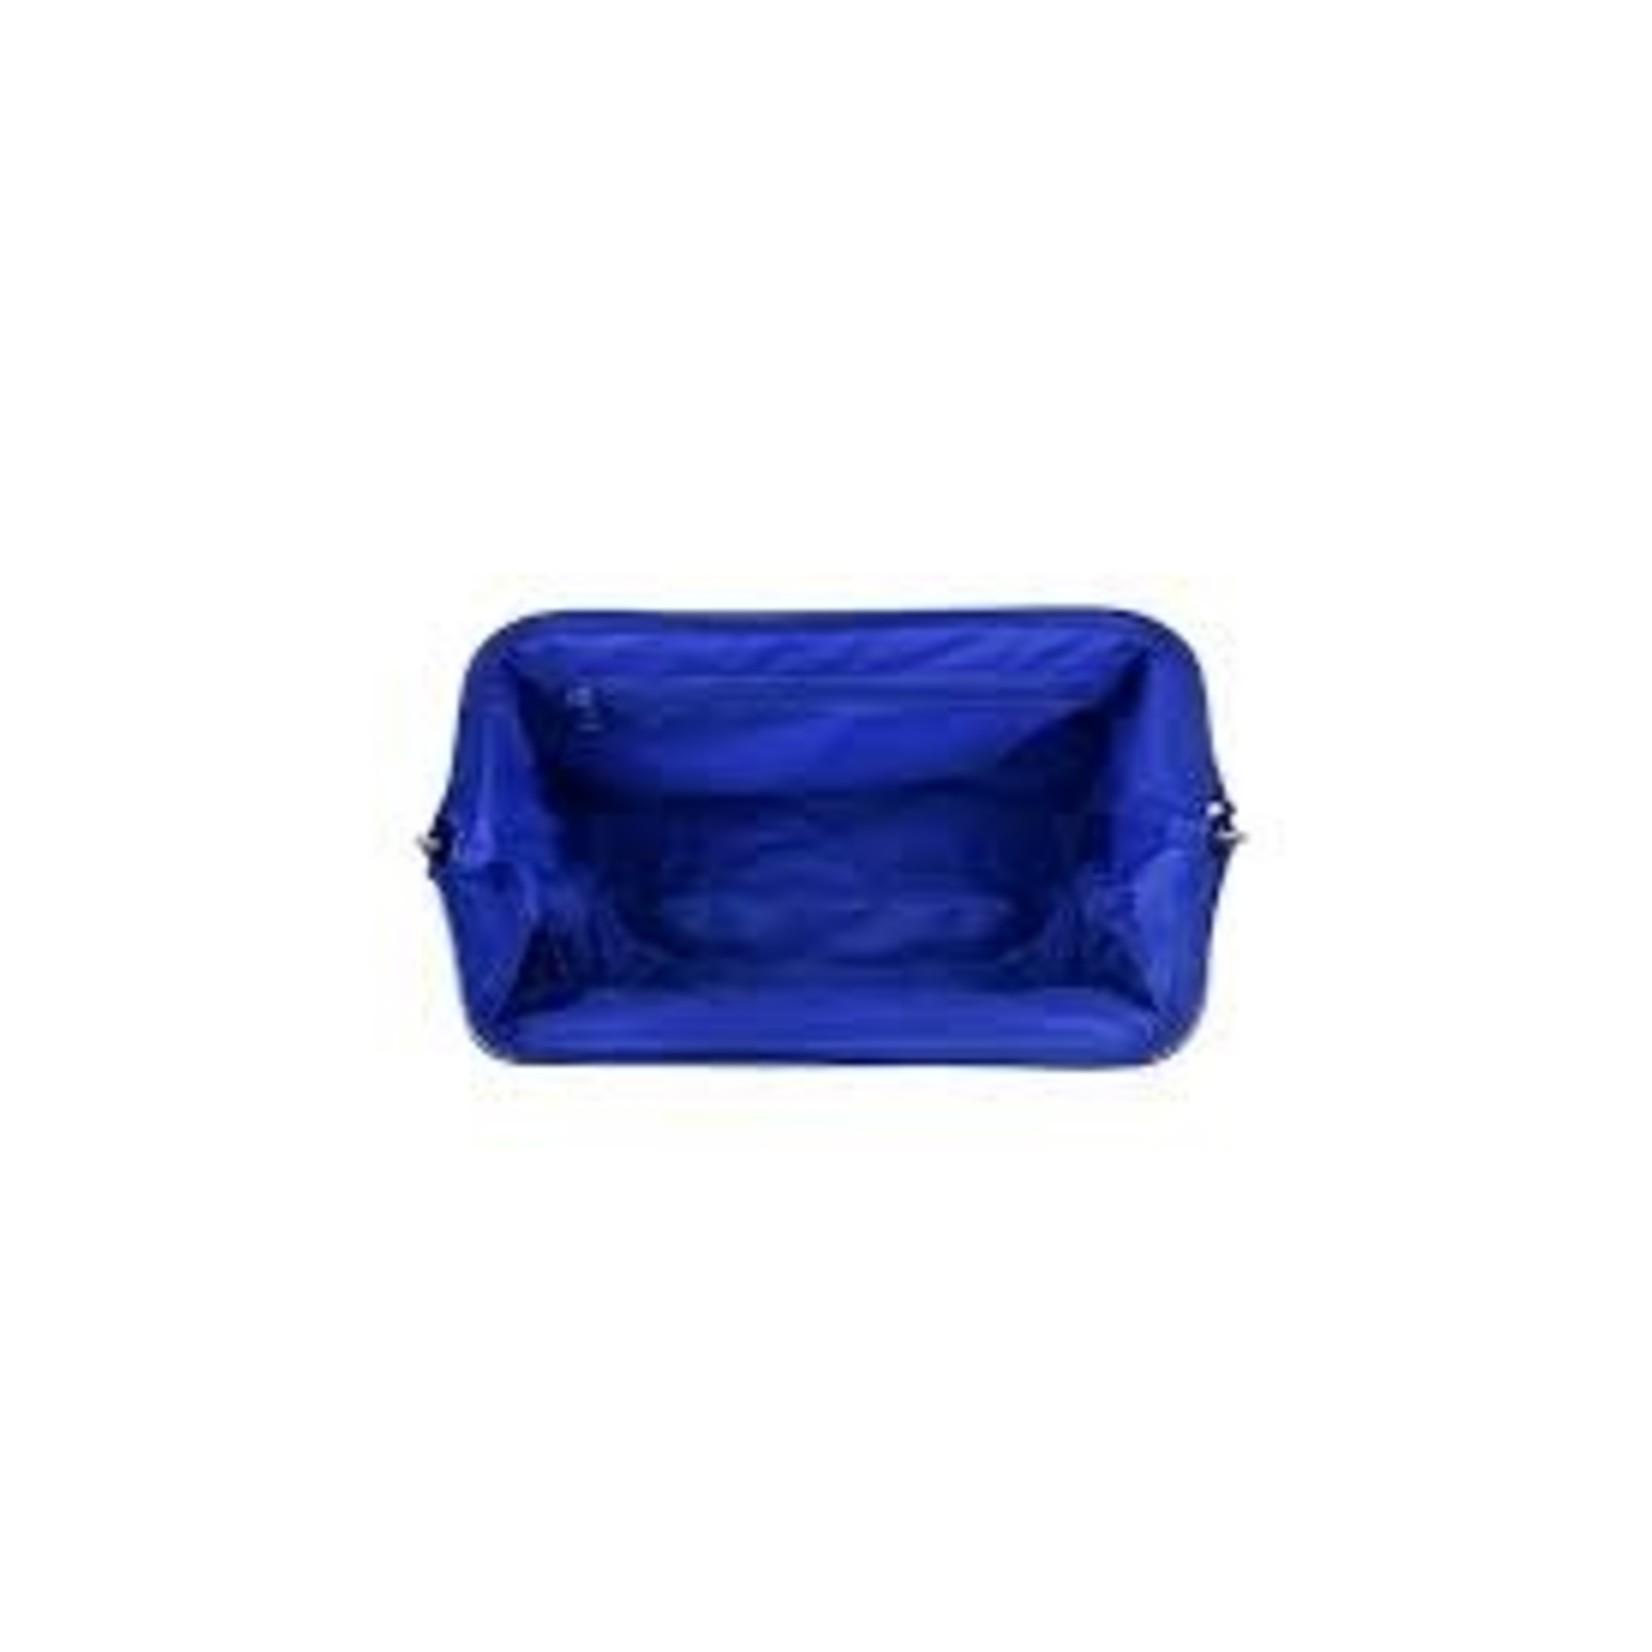 PLUME TOILETRY KIT Exotic Blue